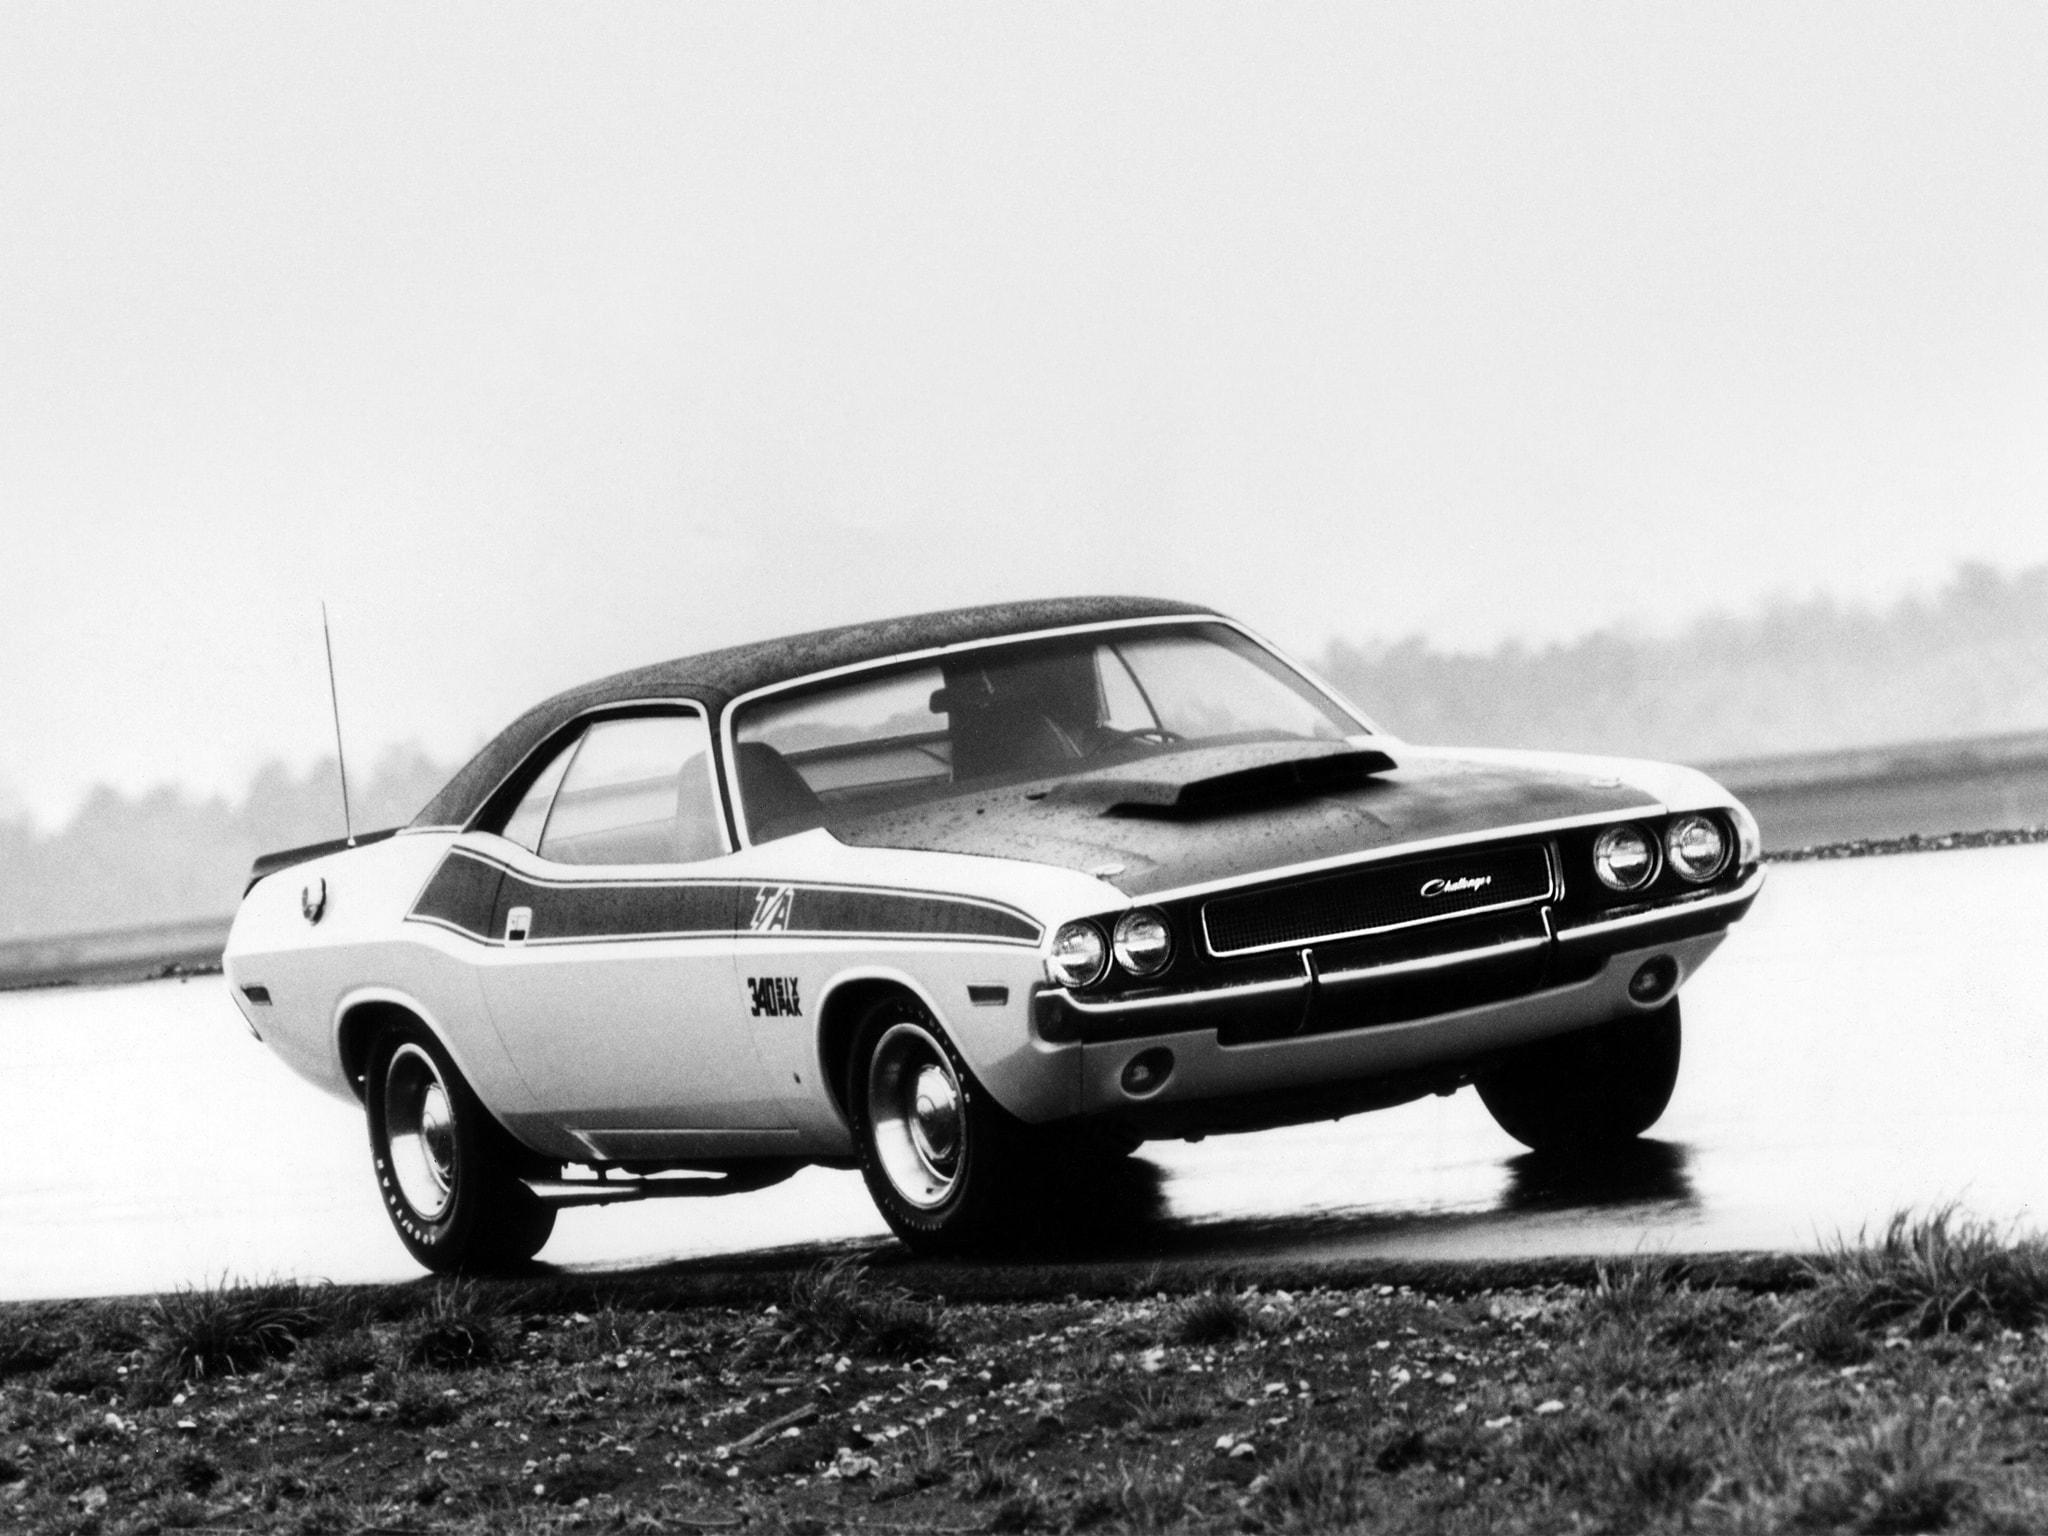 1970 Dodge Challenger T A Hd Wallpapers 7wallpapers Net